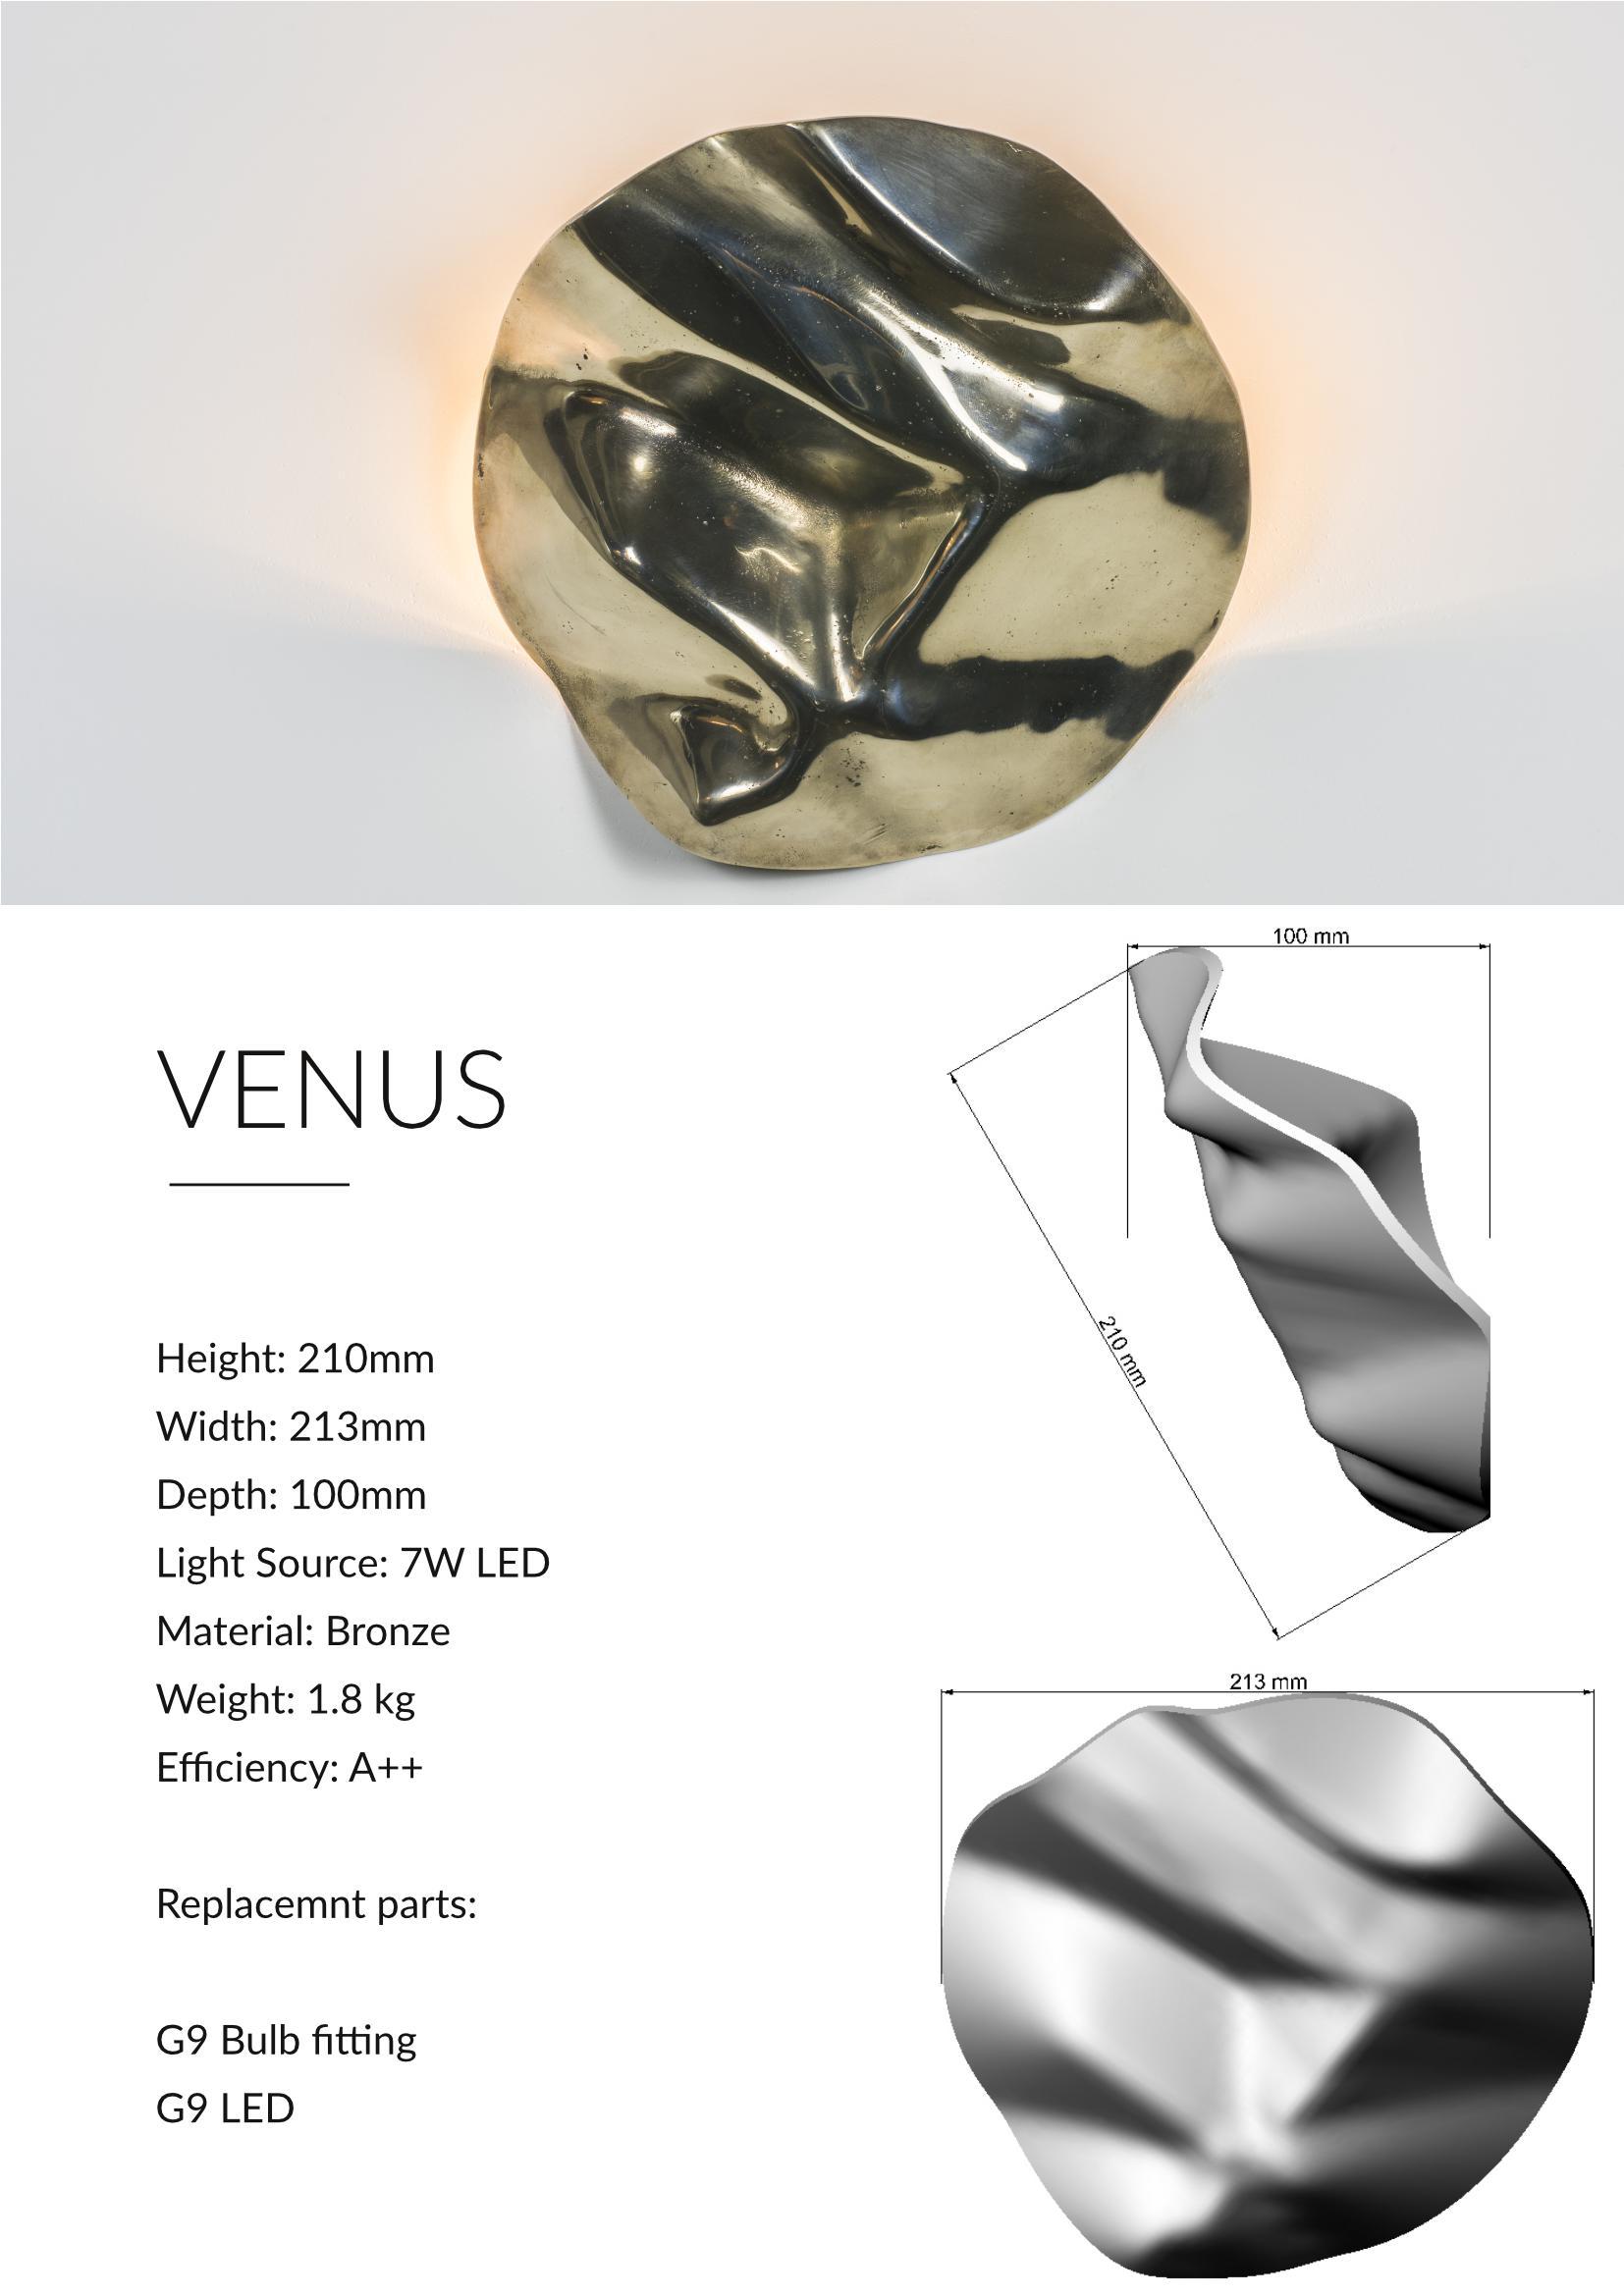 Venus Contemporary Uplighter Design Technical Sheet